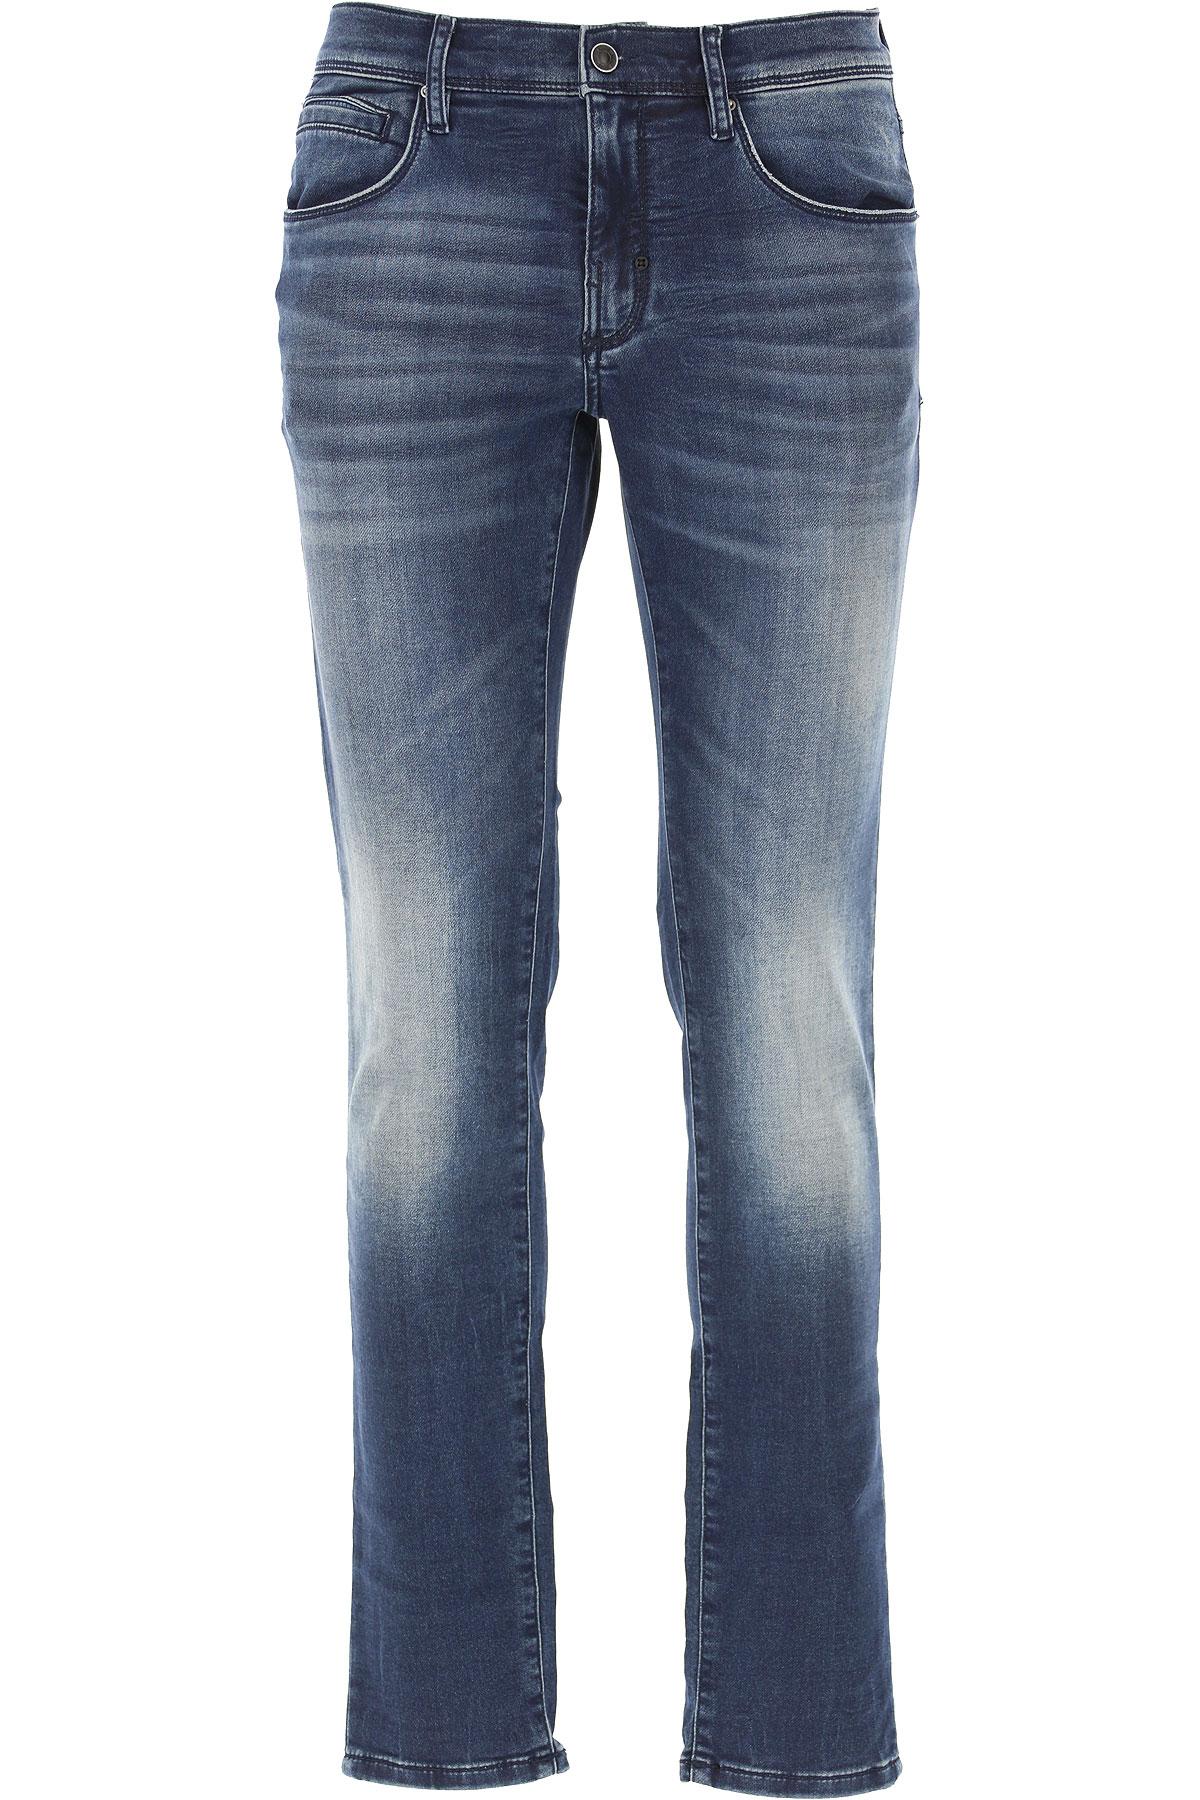 Antony Morato Jeans On Sale, Denim Blue, Cotton, 2019, 32 36